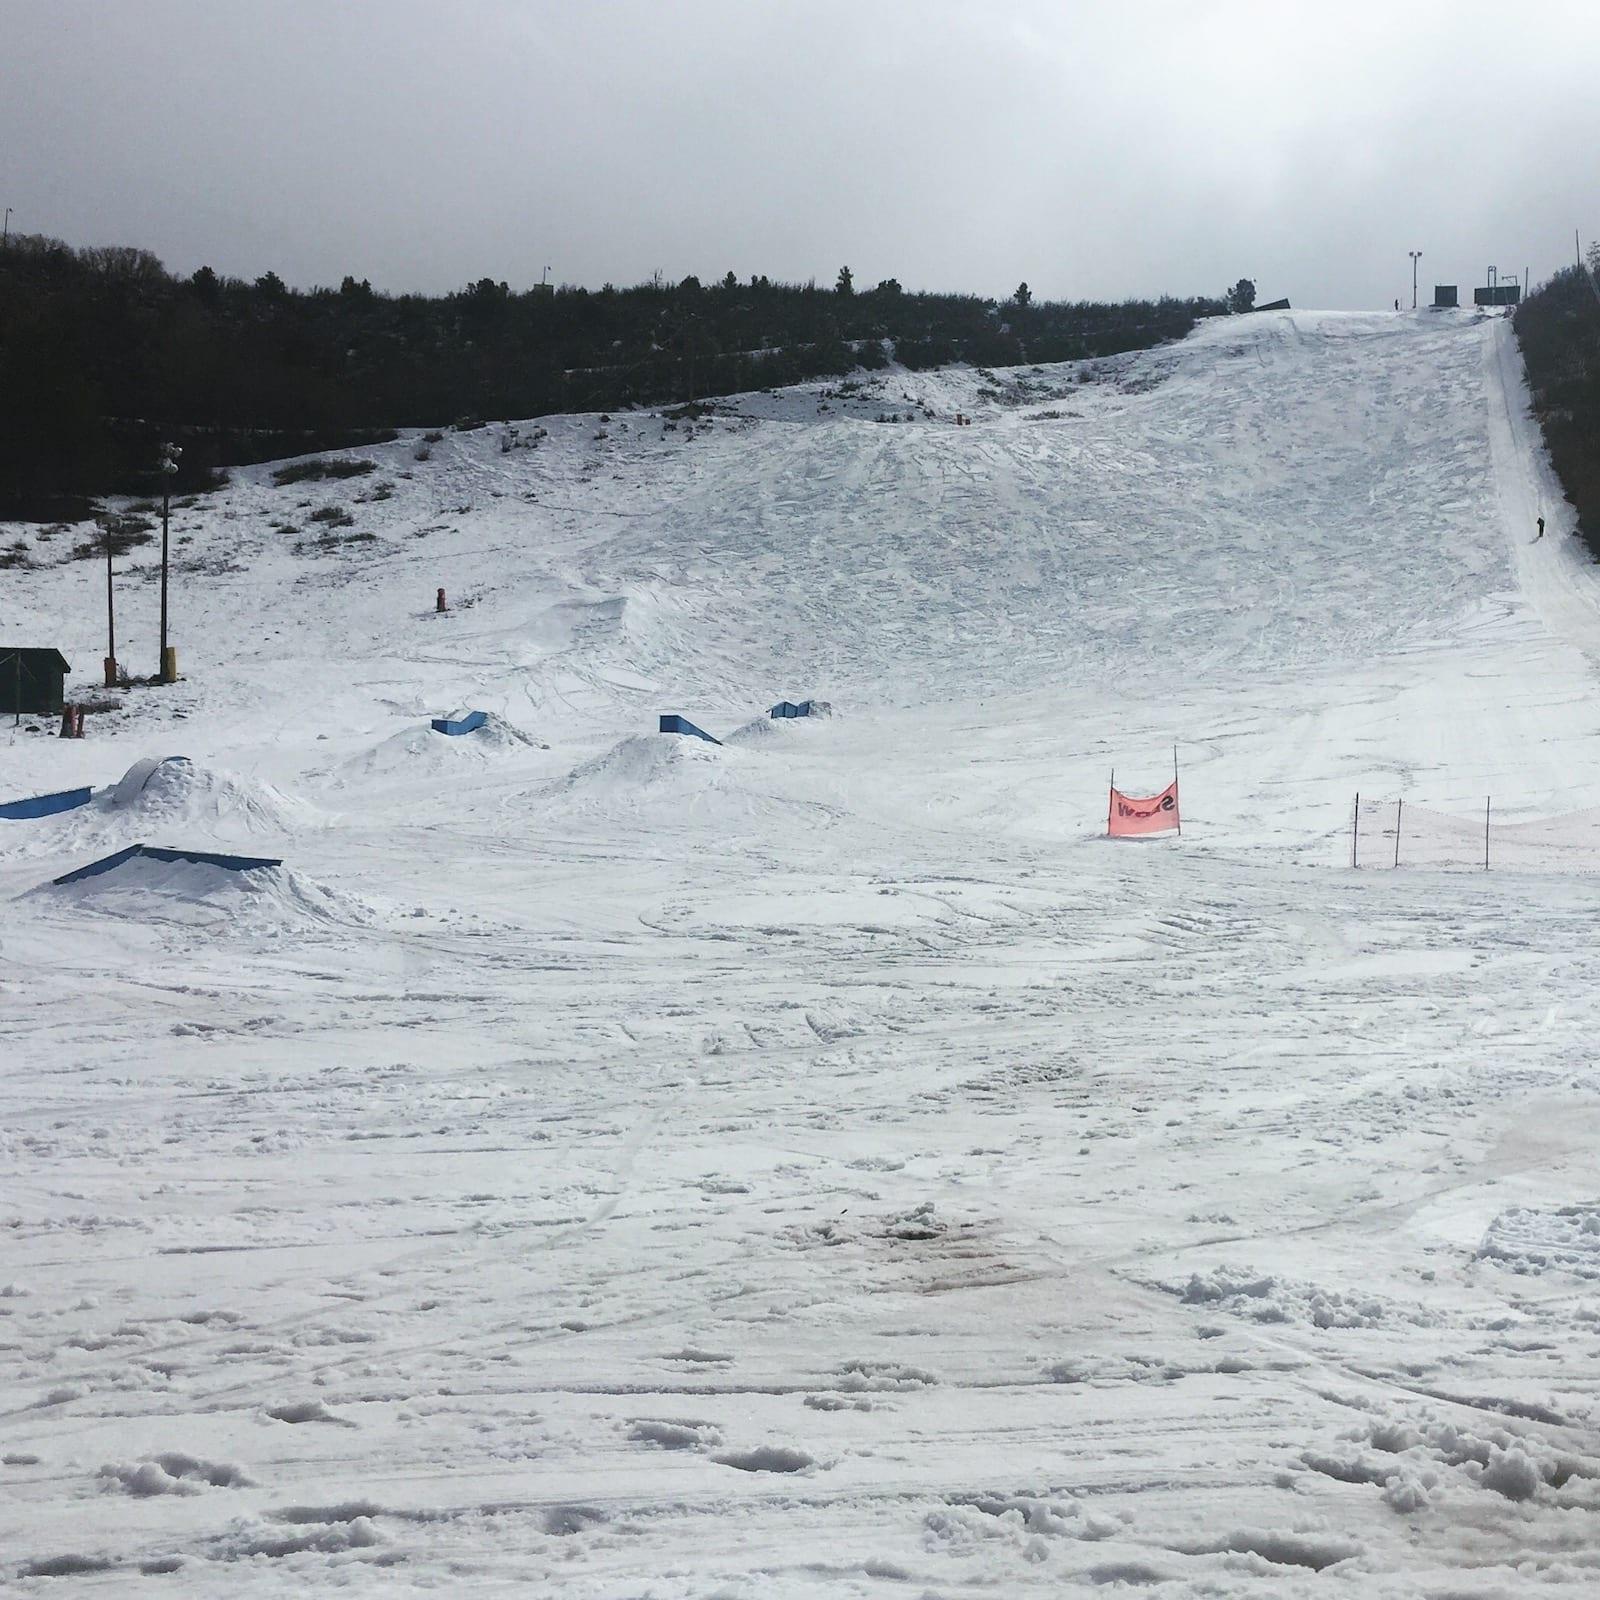 Chapman Hill Municipal Ski Area Durango Colorado Winter